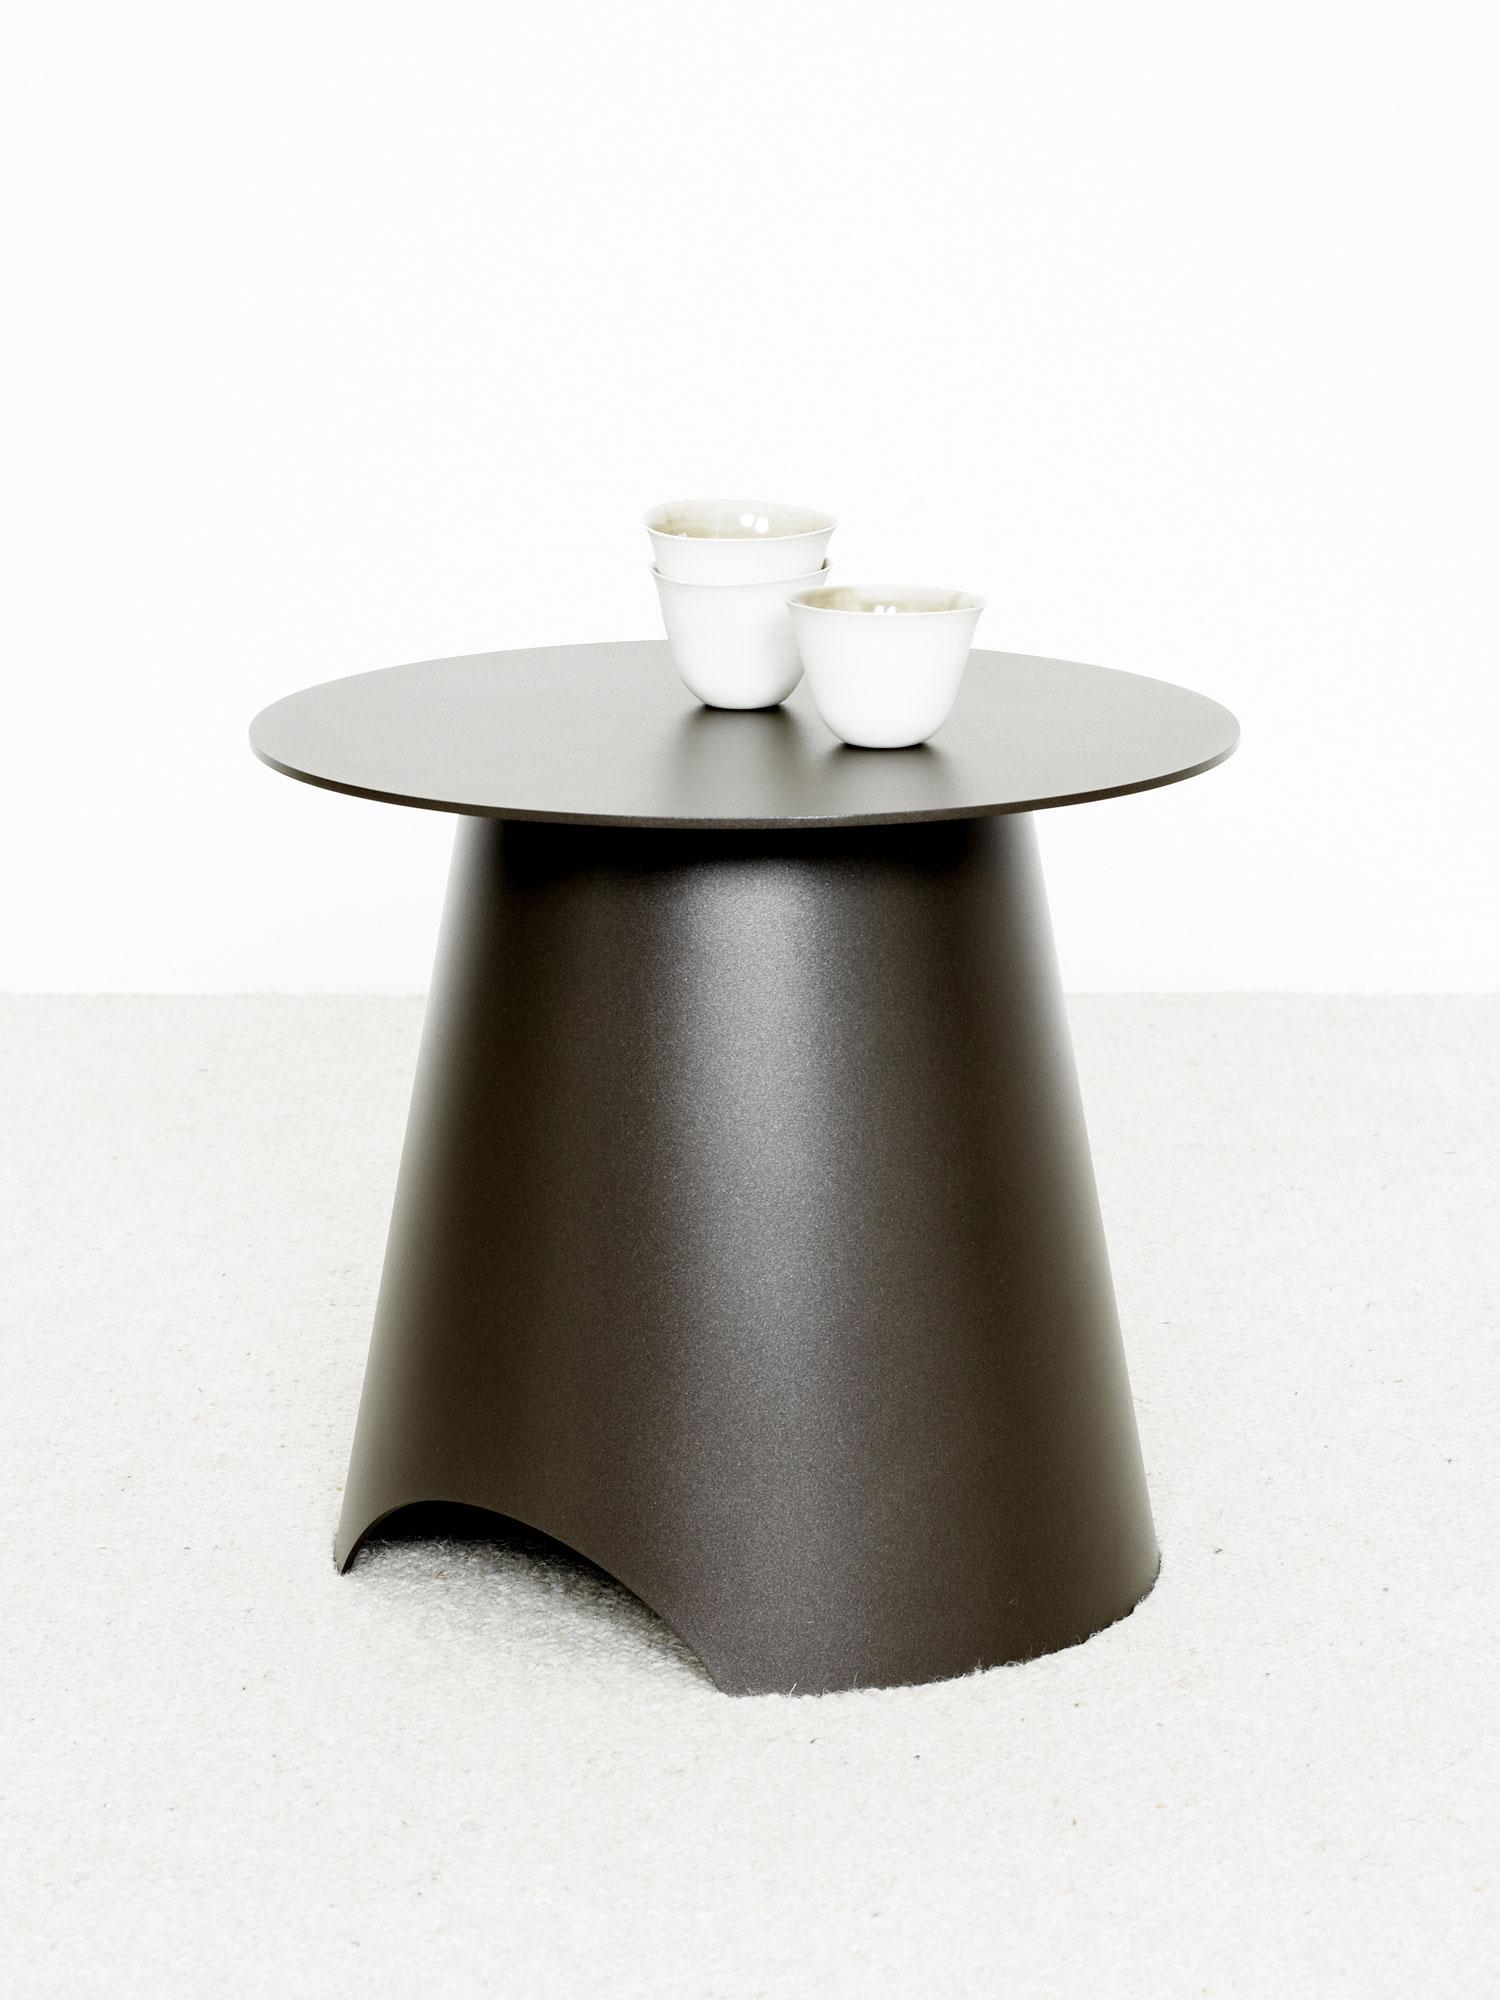 bob sofa christophe delcourt orlando florida table appoint max acier |